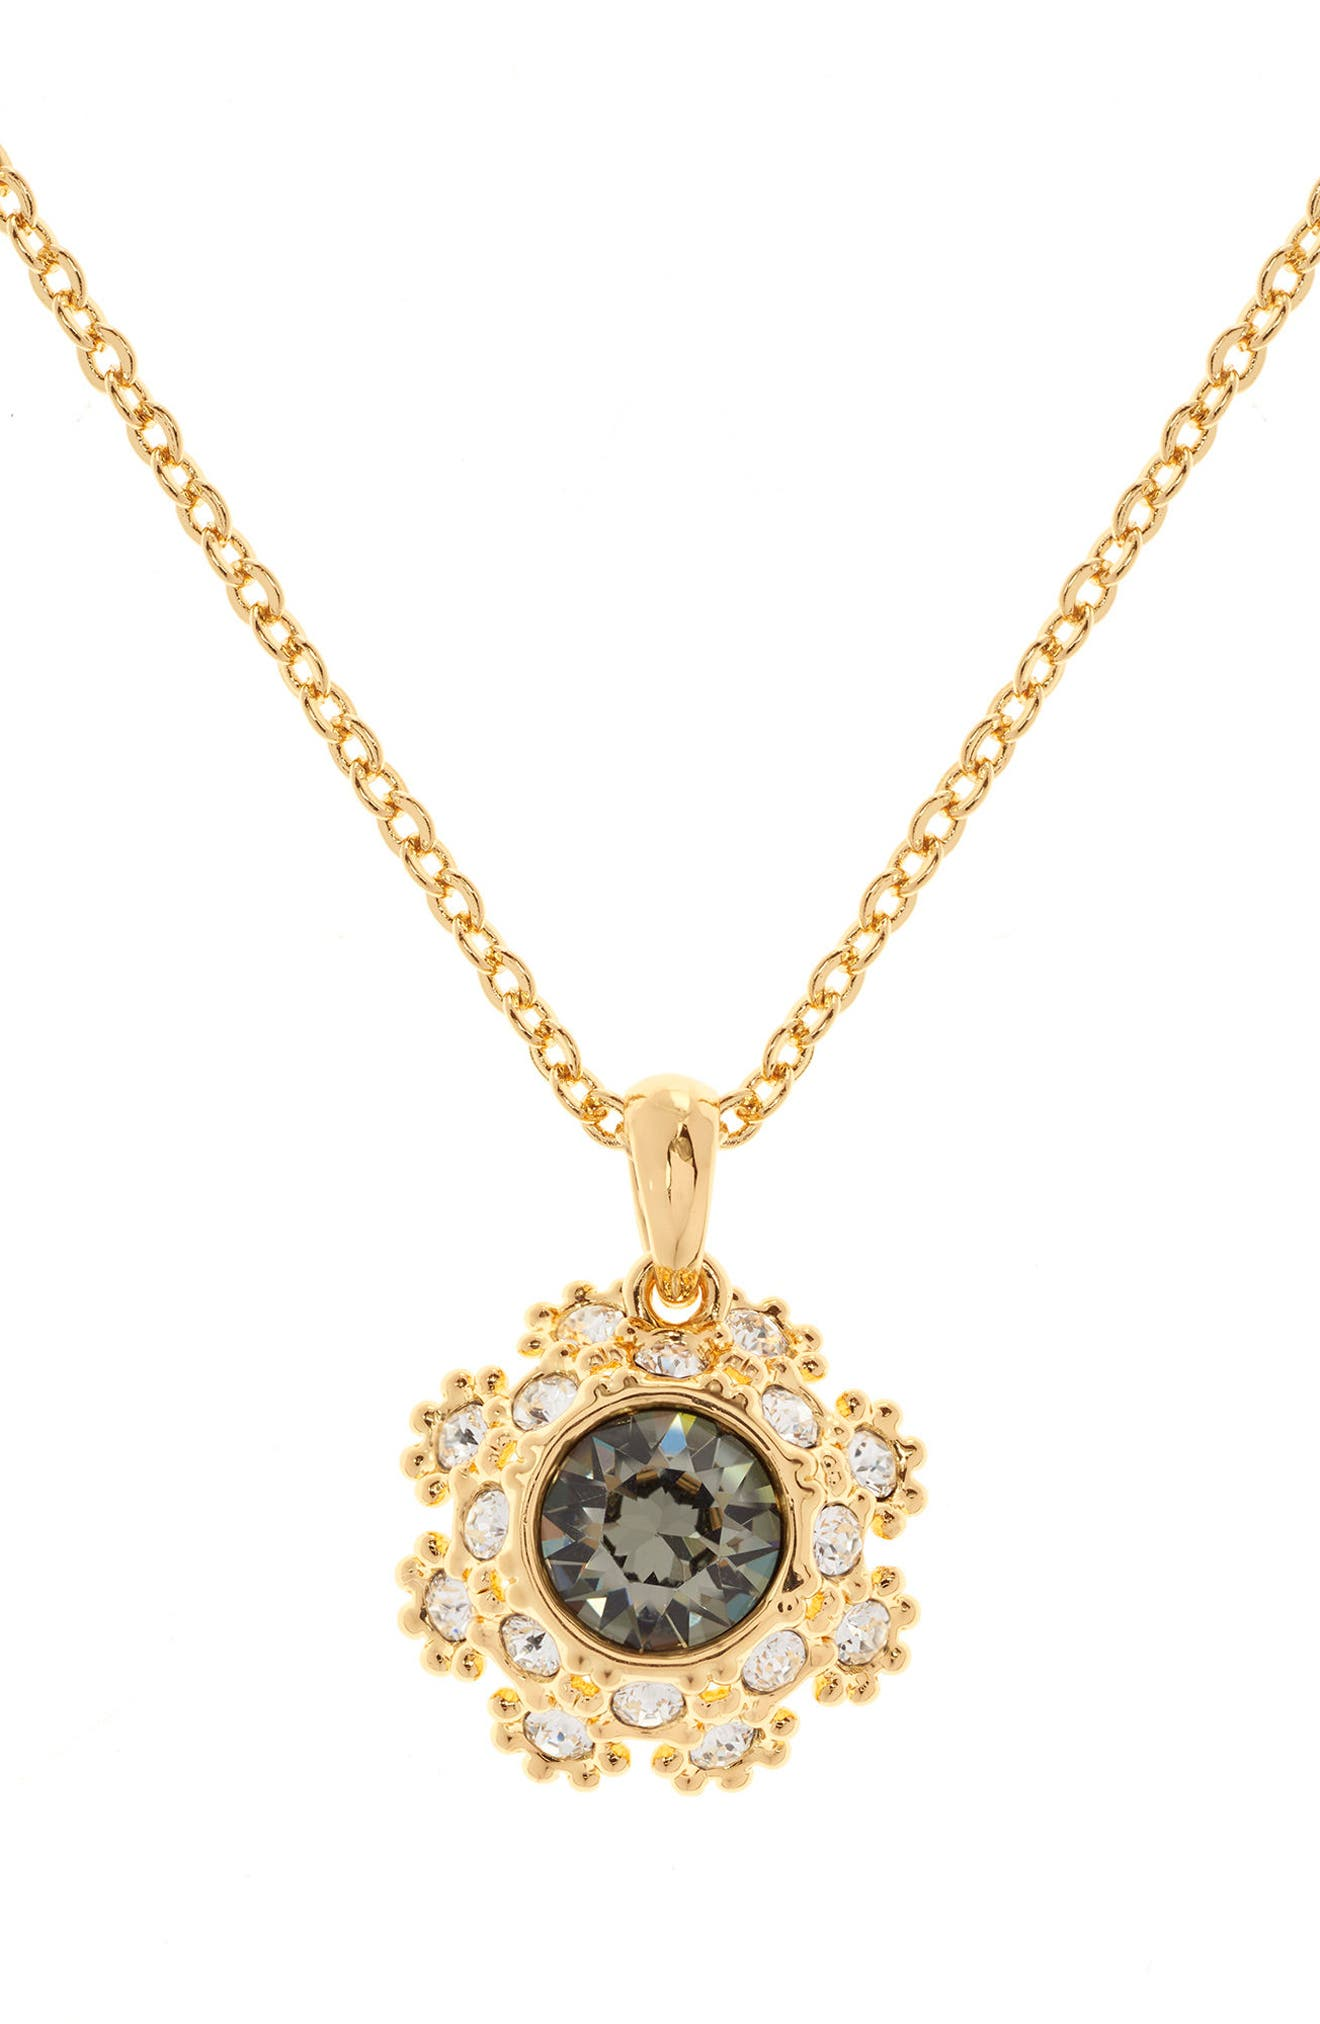 Crystal Daisy Lace Pendant Necklace,                             Alternate thumbnail 2, color,                             Jet